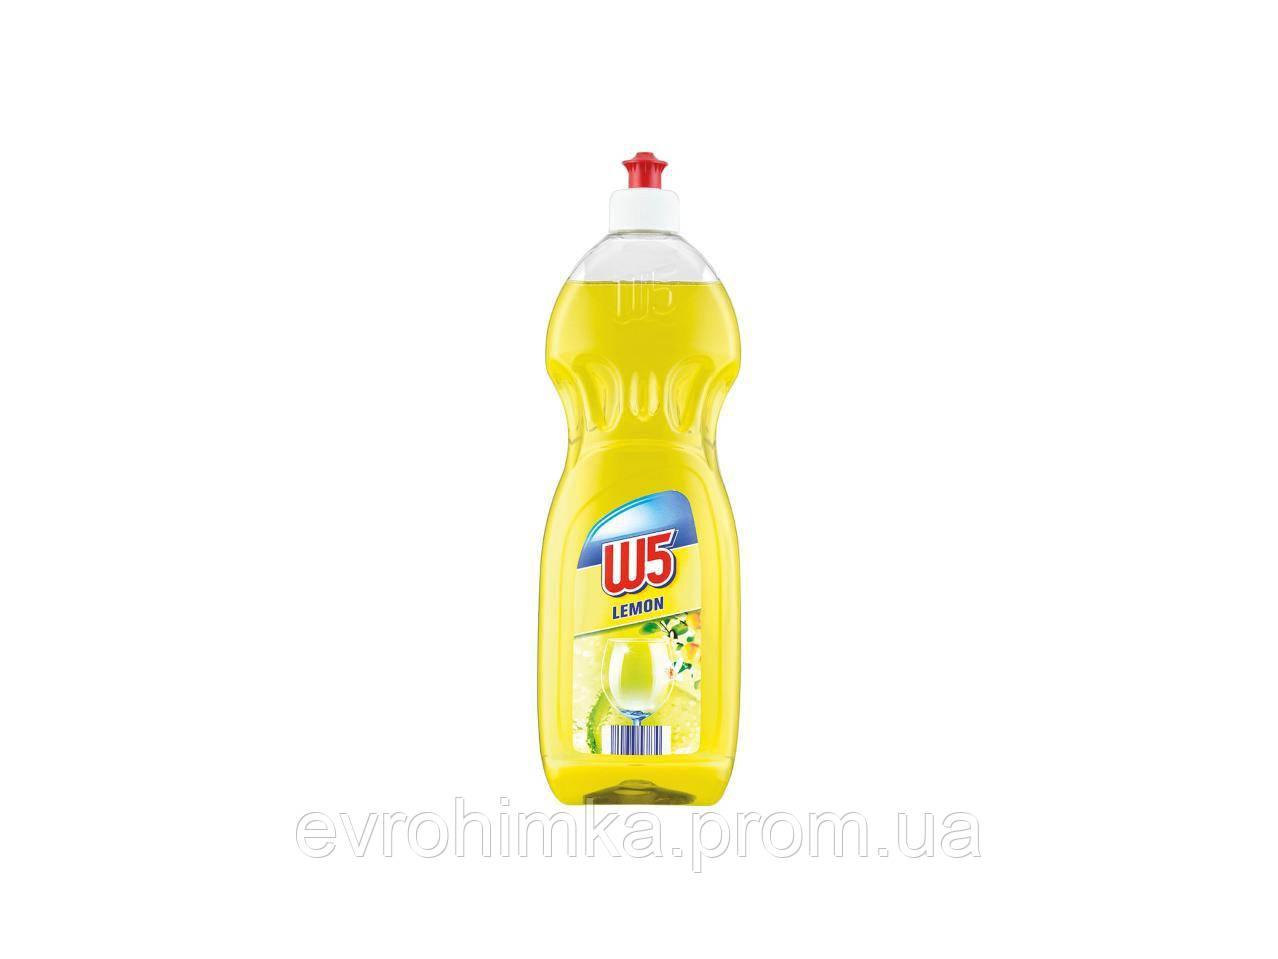 Средство для мытья посуды W5 лимон 1000 мл